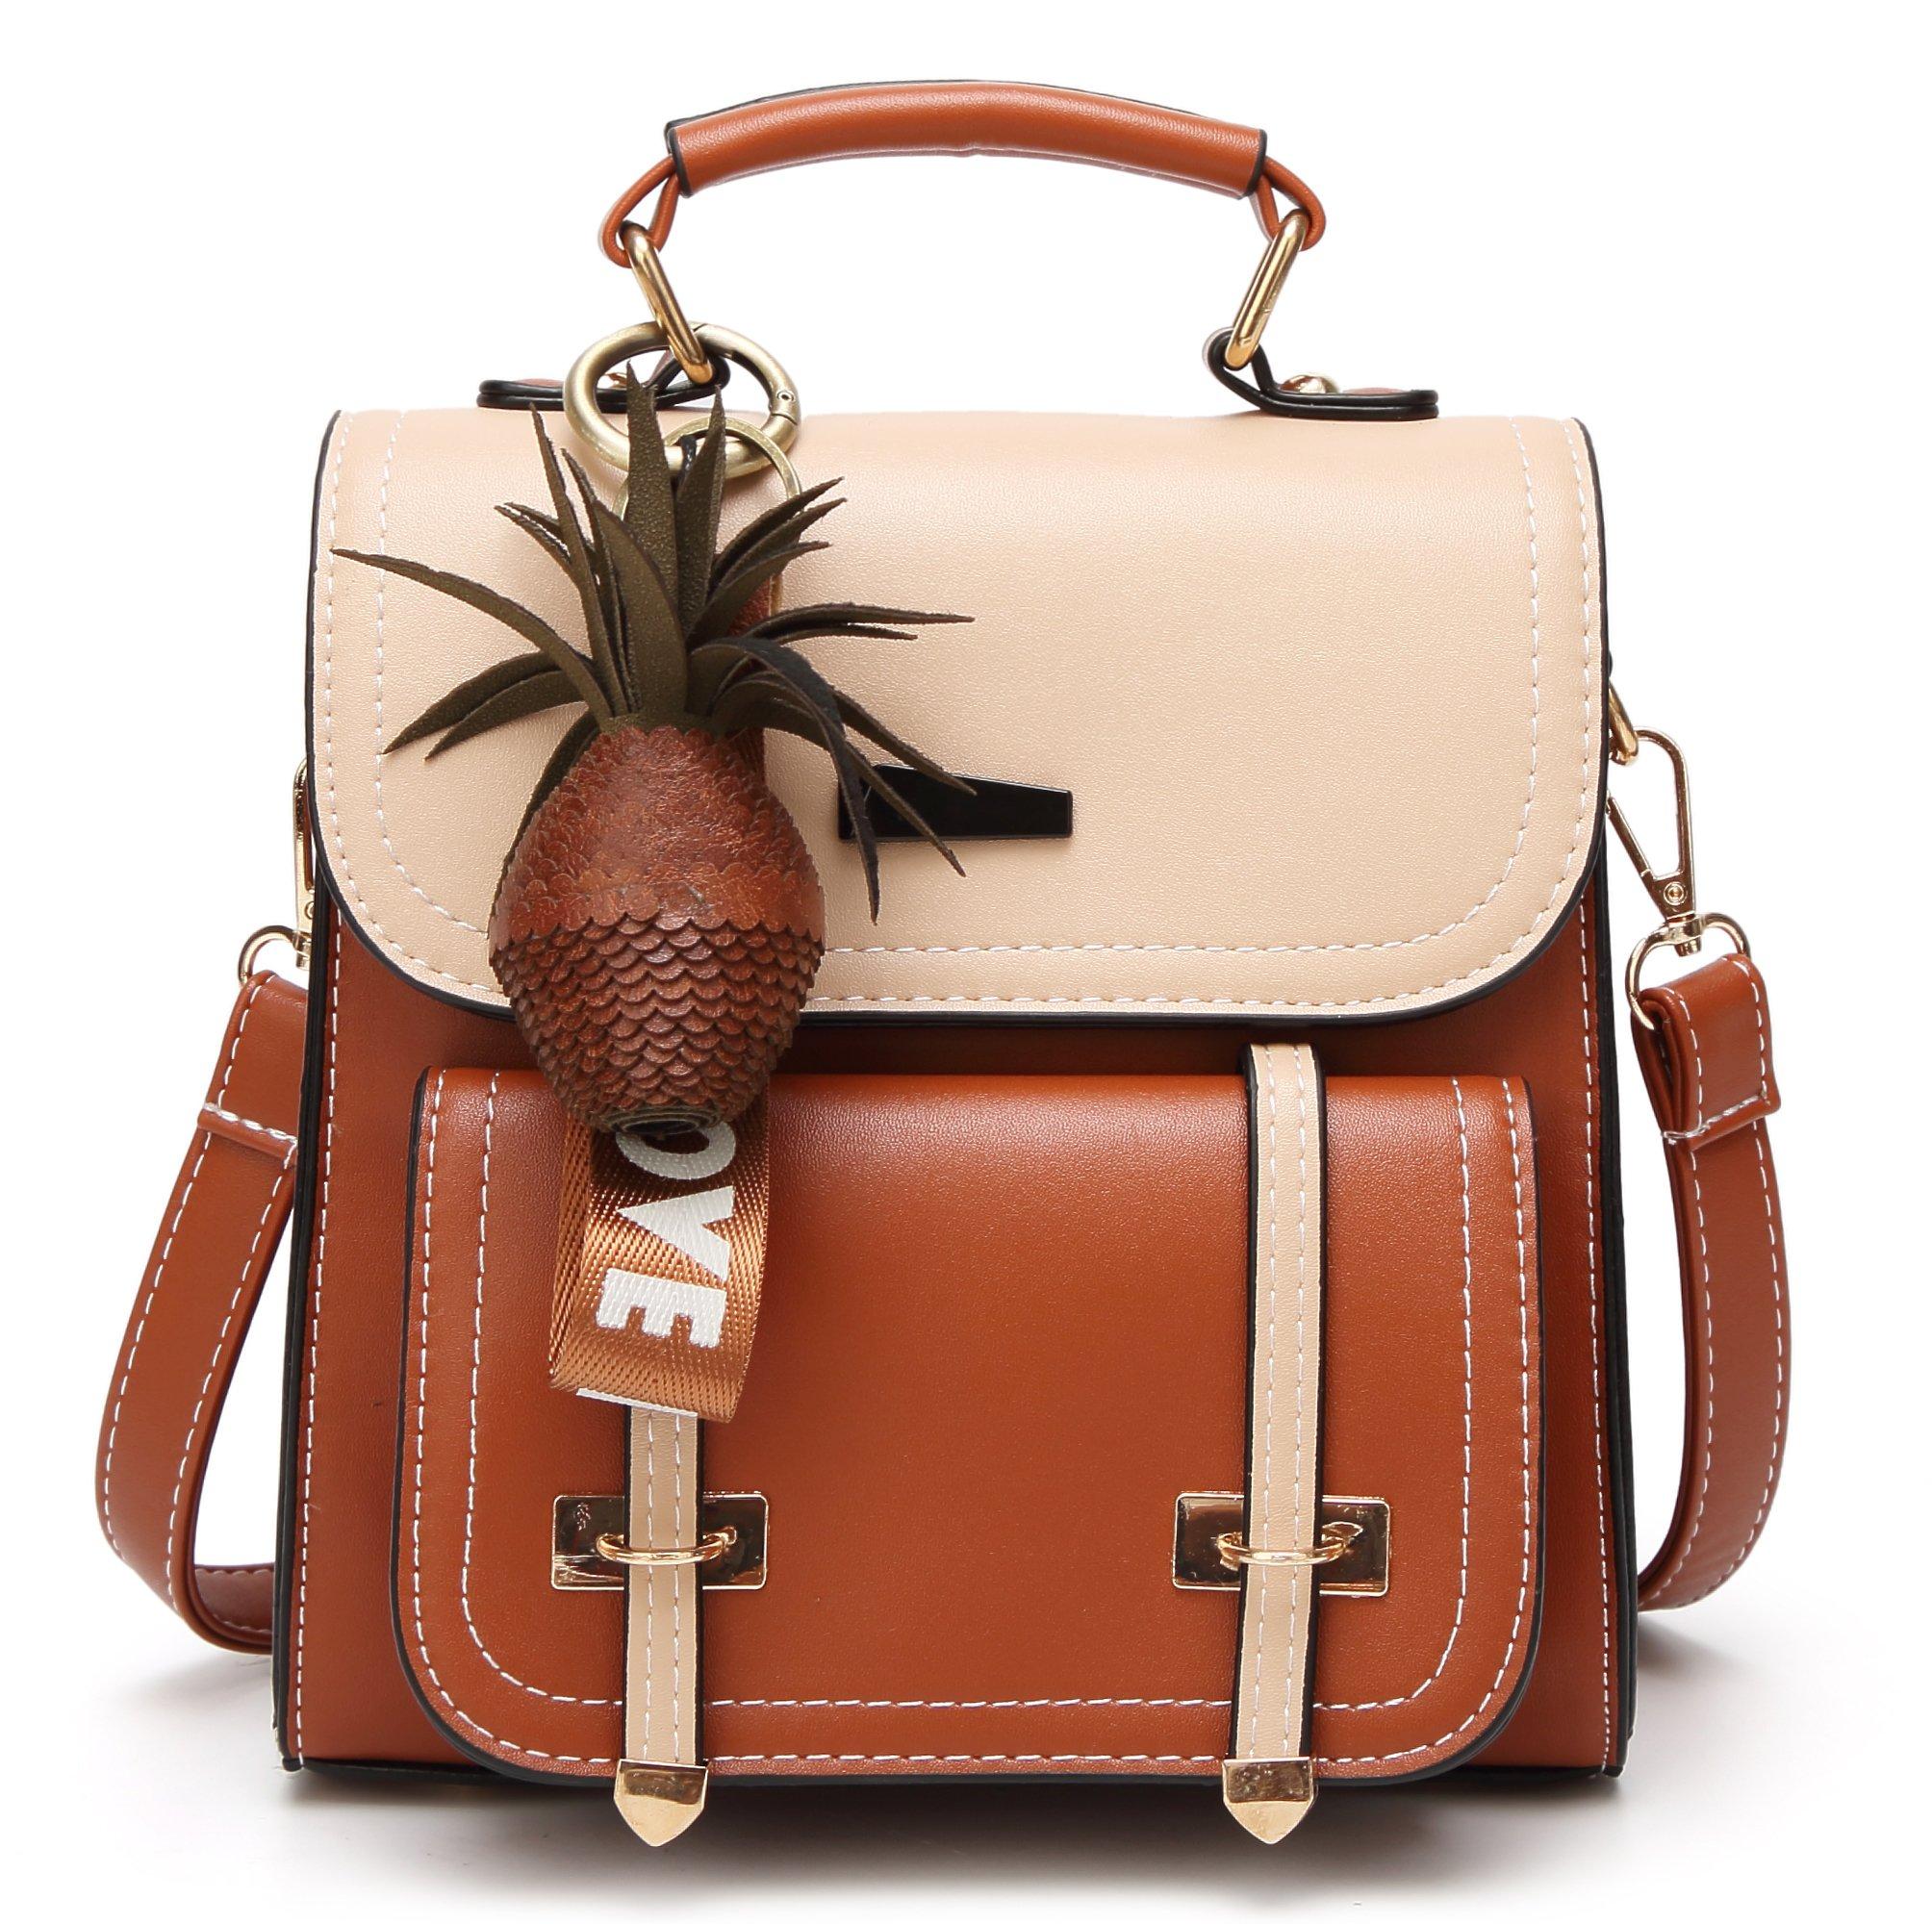 Small Backpack Purse Women Satchels Handbag Fashion Travel Bag (Brown-khaki)